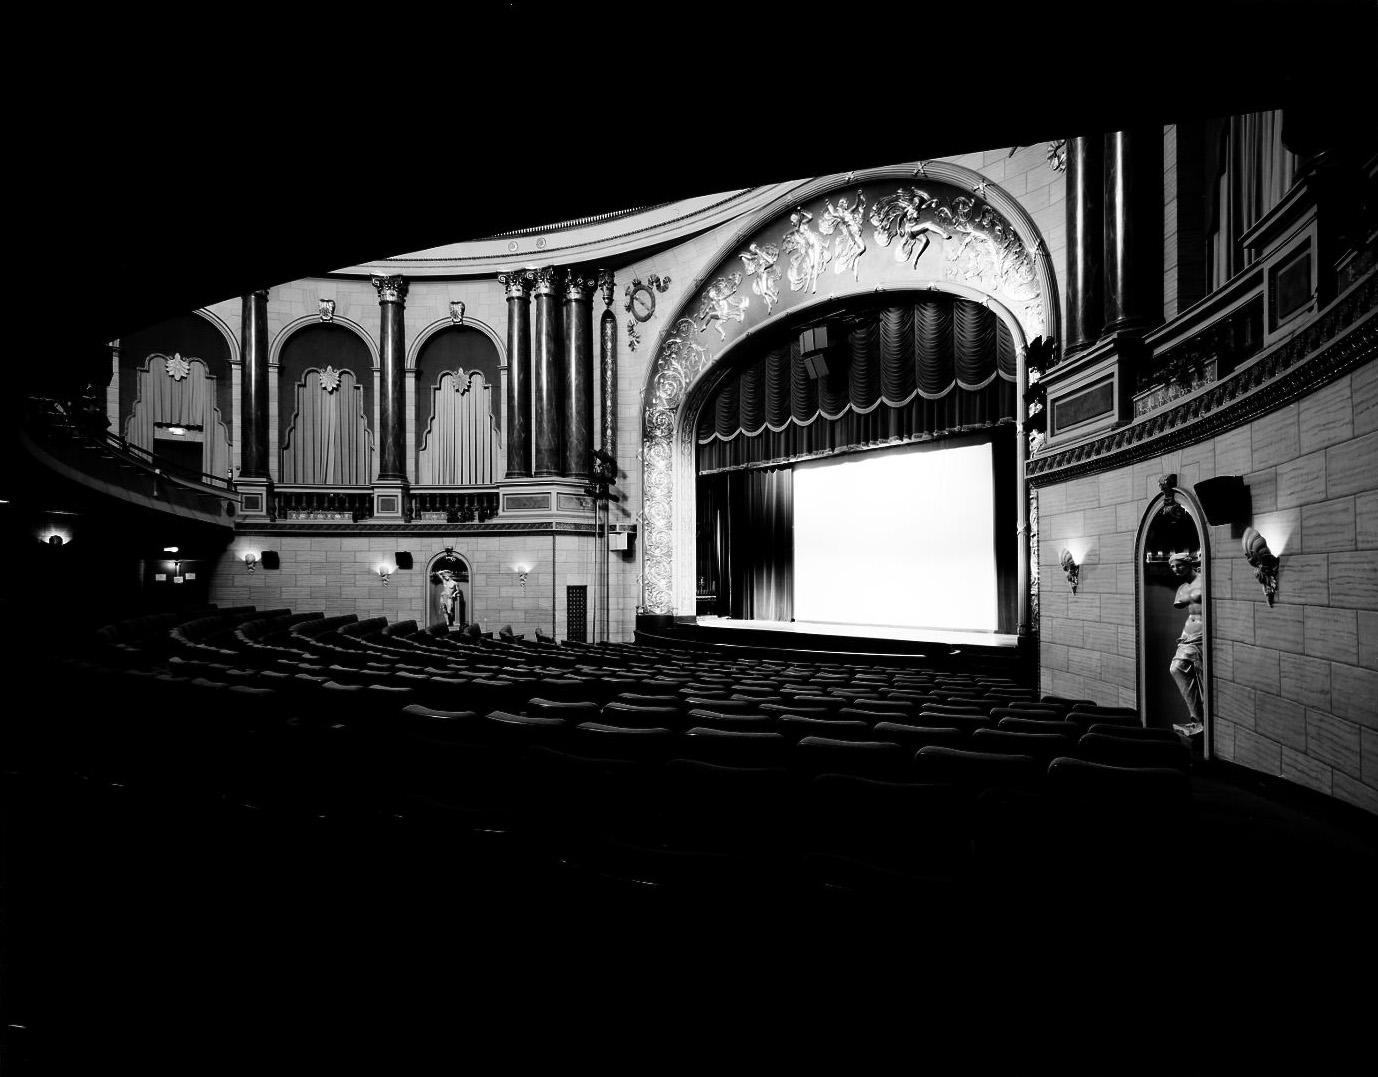 carolinatheater.jpg